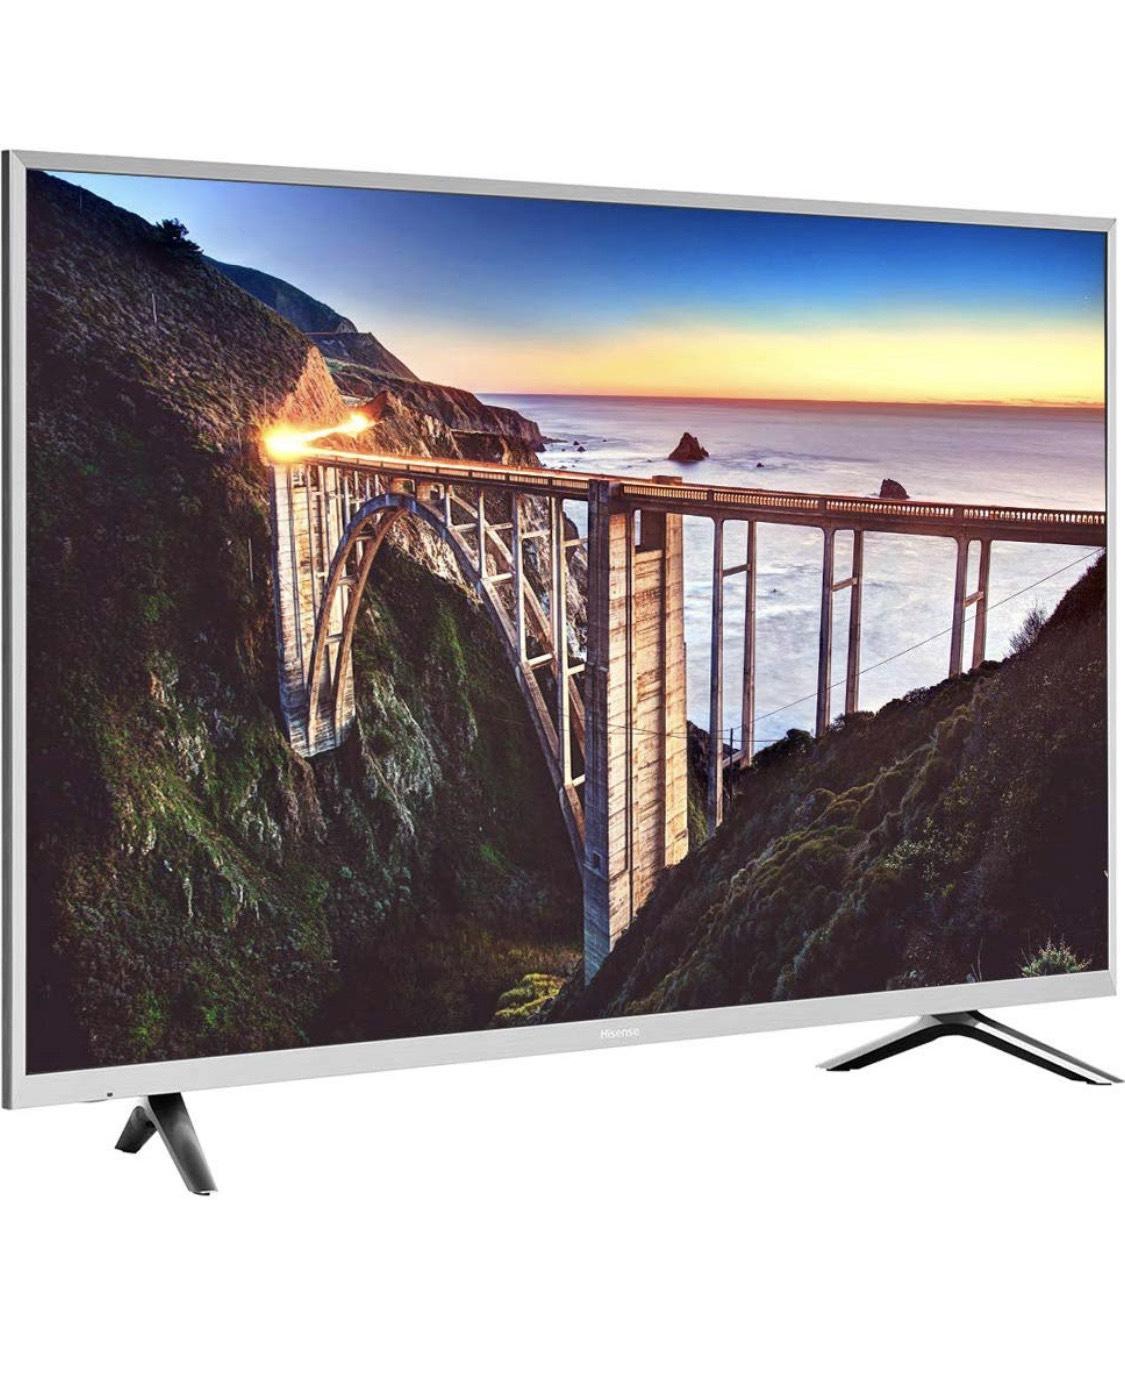 Hisense Ultra HD 60 inch